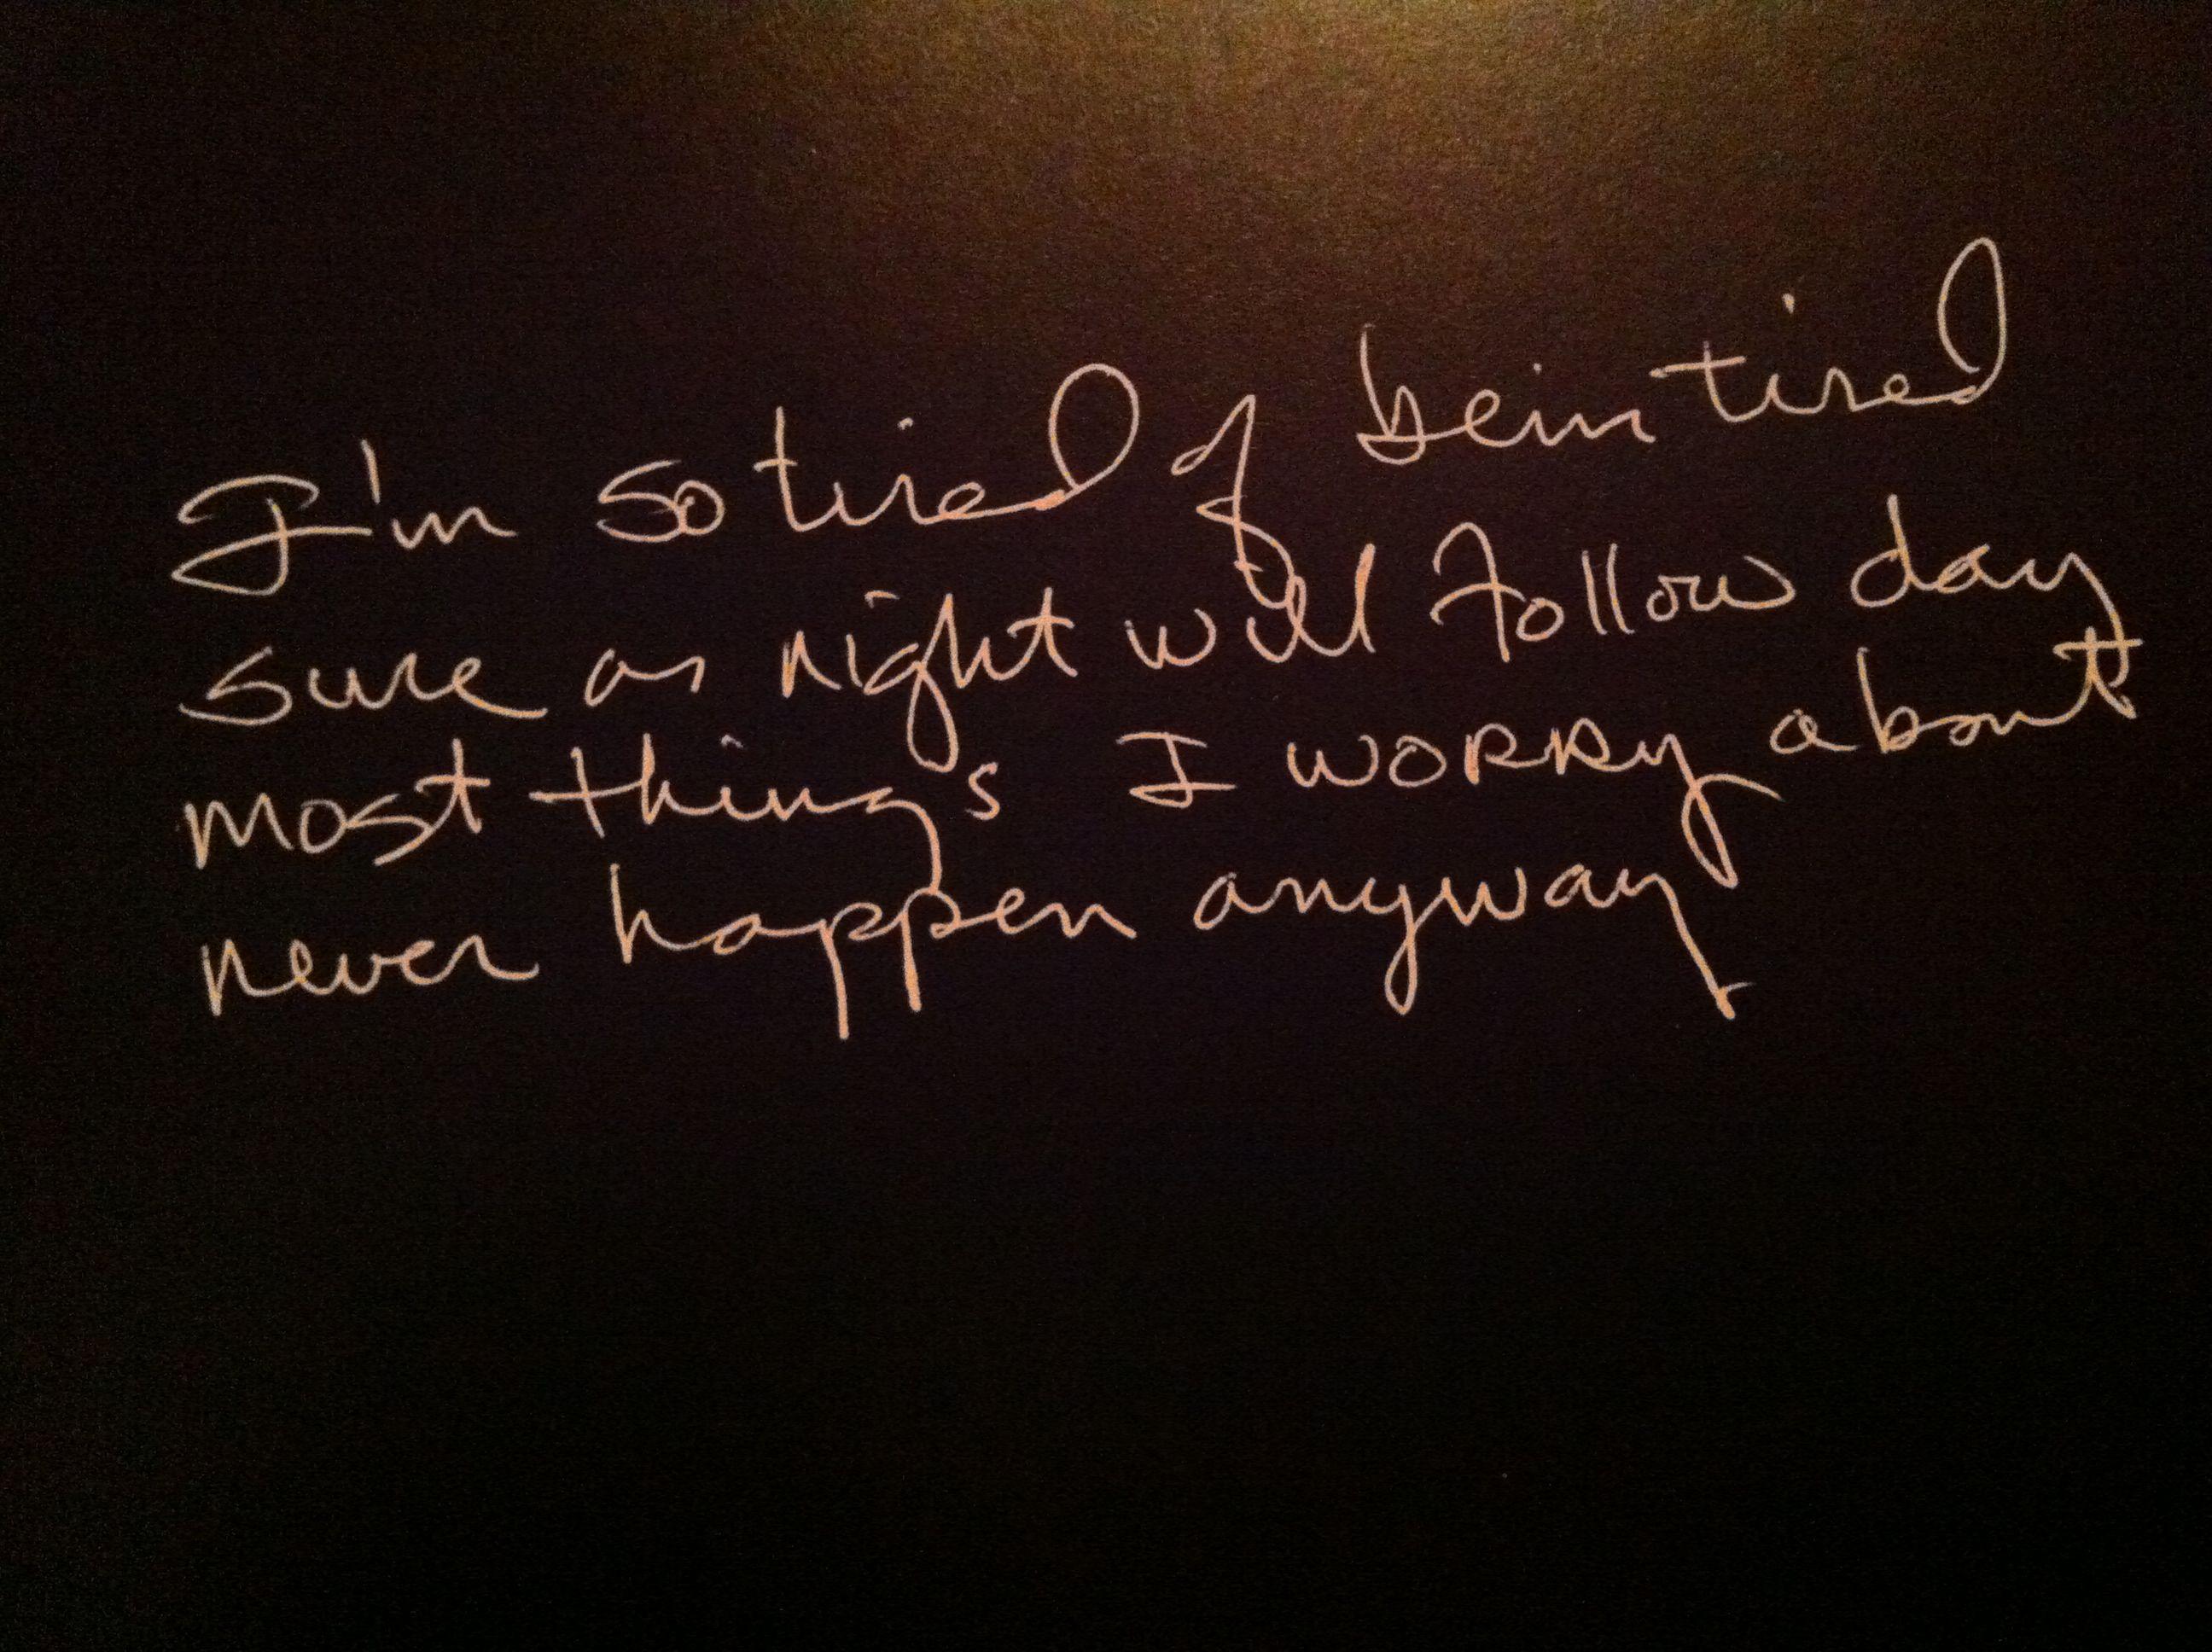 Best 25 tom petty lyrics ideas on pinterest best tom petty tom petty crawling back to you hexwebz Images